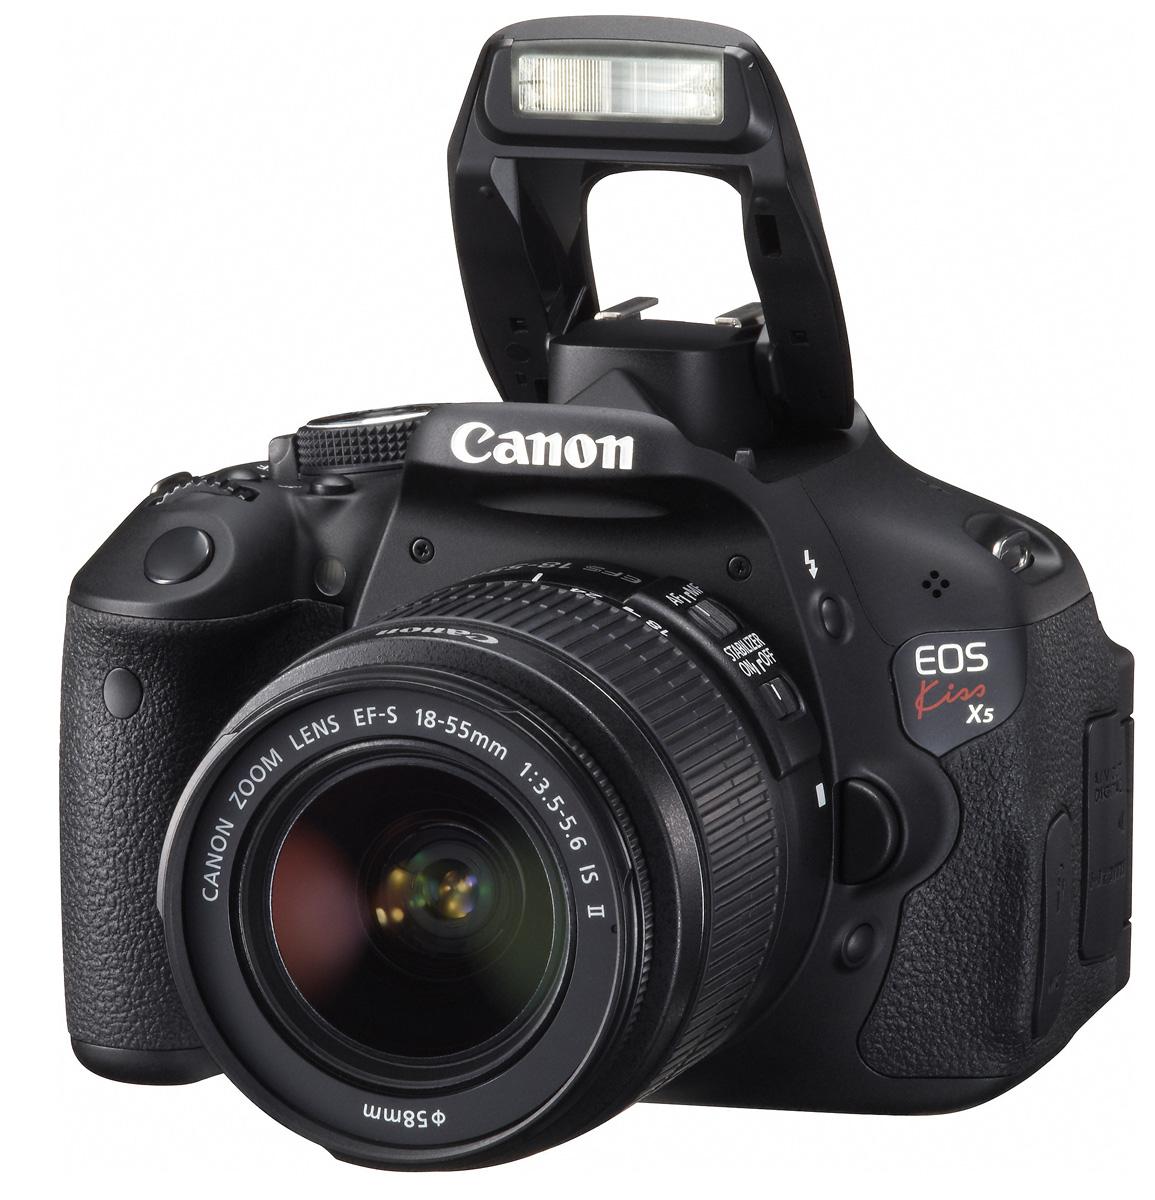 EF-S18-55 IS II lens Kit, Canon EOS Kiss X5 [18 million paintings great & full HD movie digital SLR levkamerakis DigitalX 5 standard zoom +] [02P03Sep16]